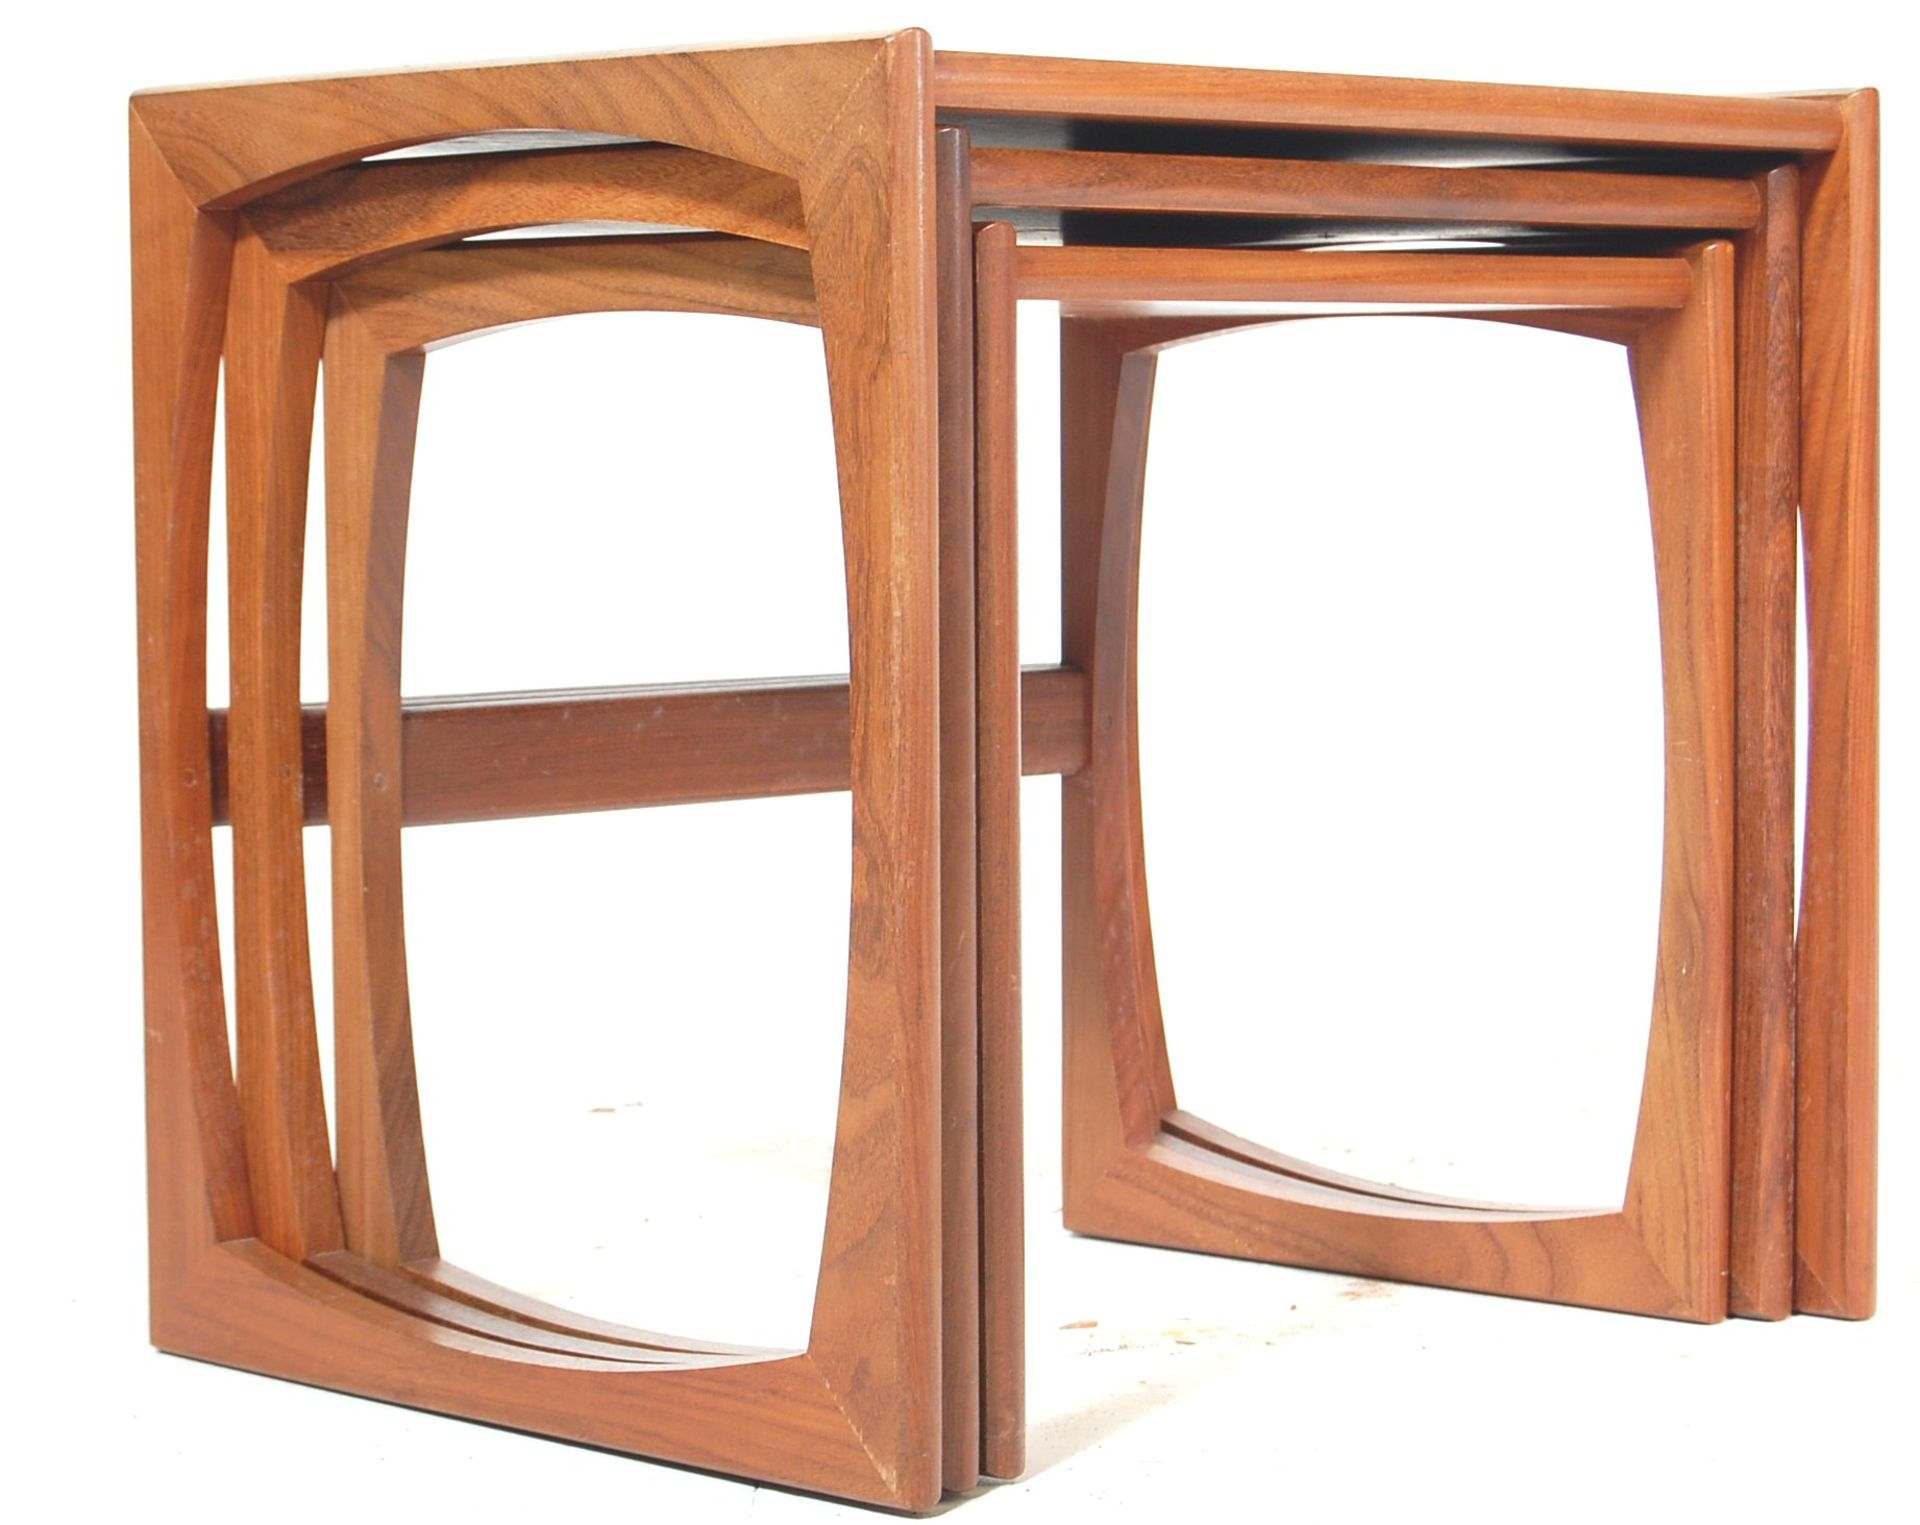 A RETRO 1960'S TEAK WOOD G PLAN FRESCO NEST OF TABLES